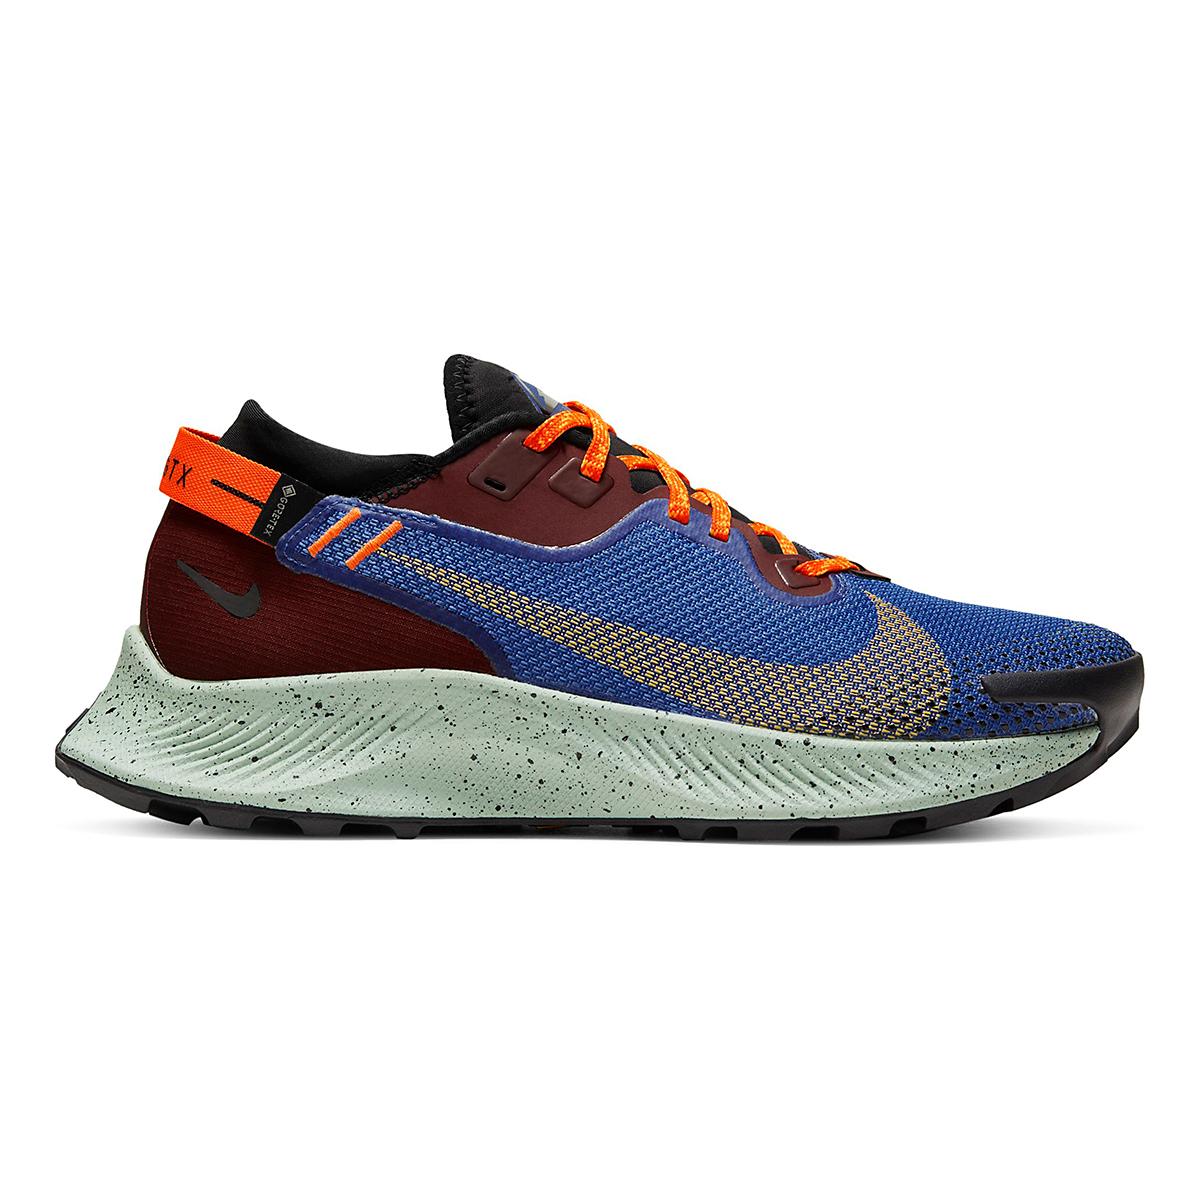 Women's Nike Pegasus Trail 2 Gore-Tex Trail Running Shoe - Color: Mystic Dates/Laser Orange/ Astronomy Blue - Size: 5 - Width: Regular, Mystic Dates/Laser Orange/ Astronomy Blue, large, image 1